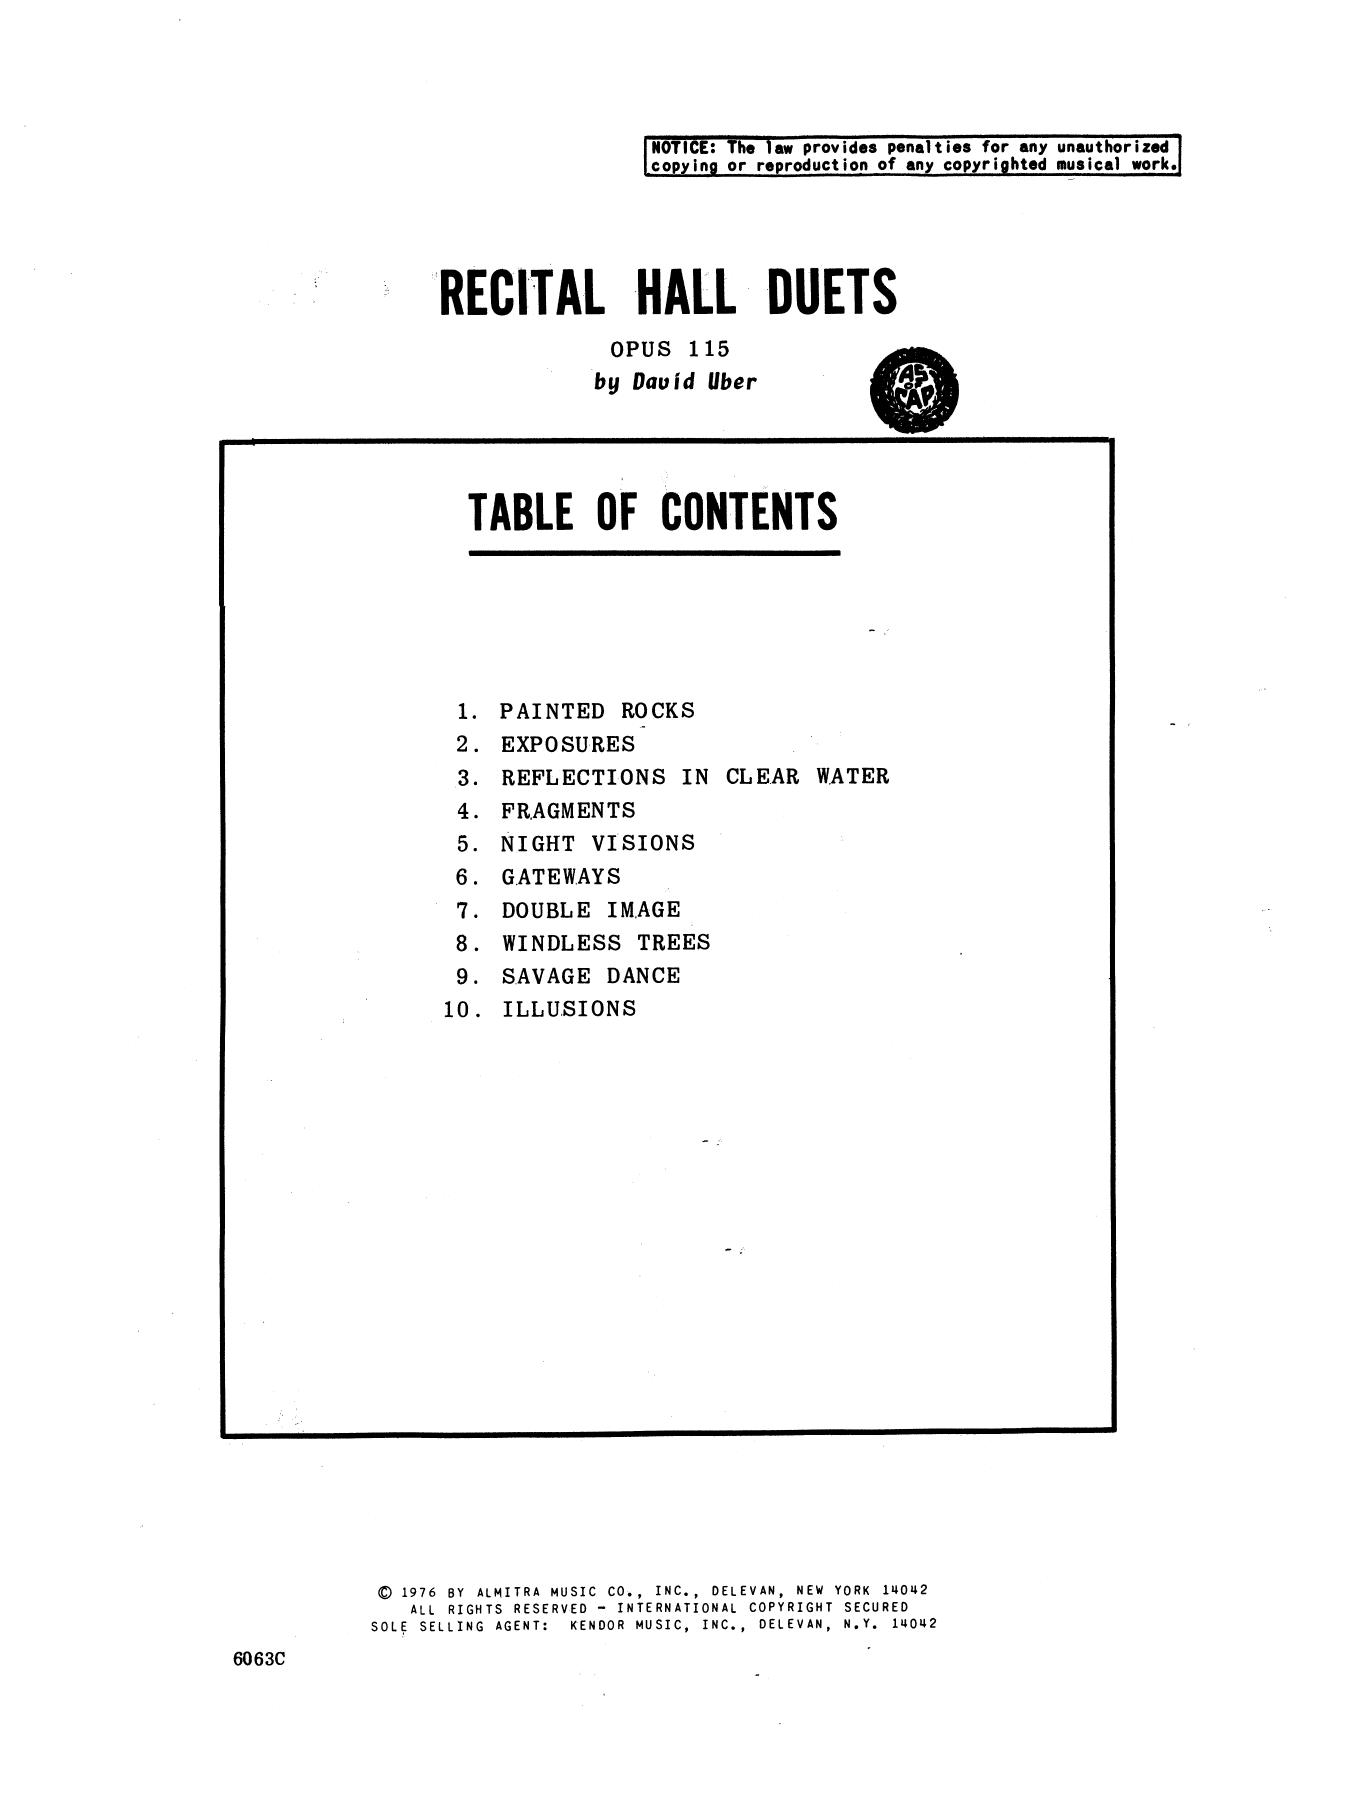 Recital Hall Duets Sheet Music